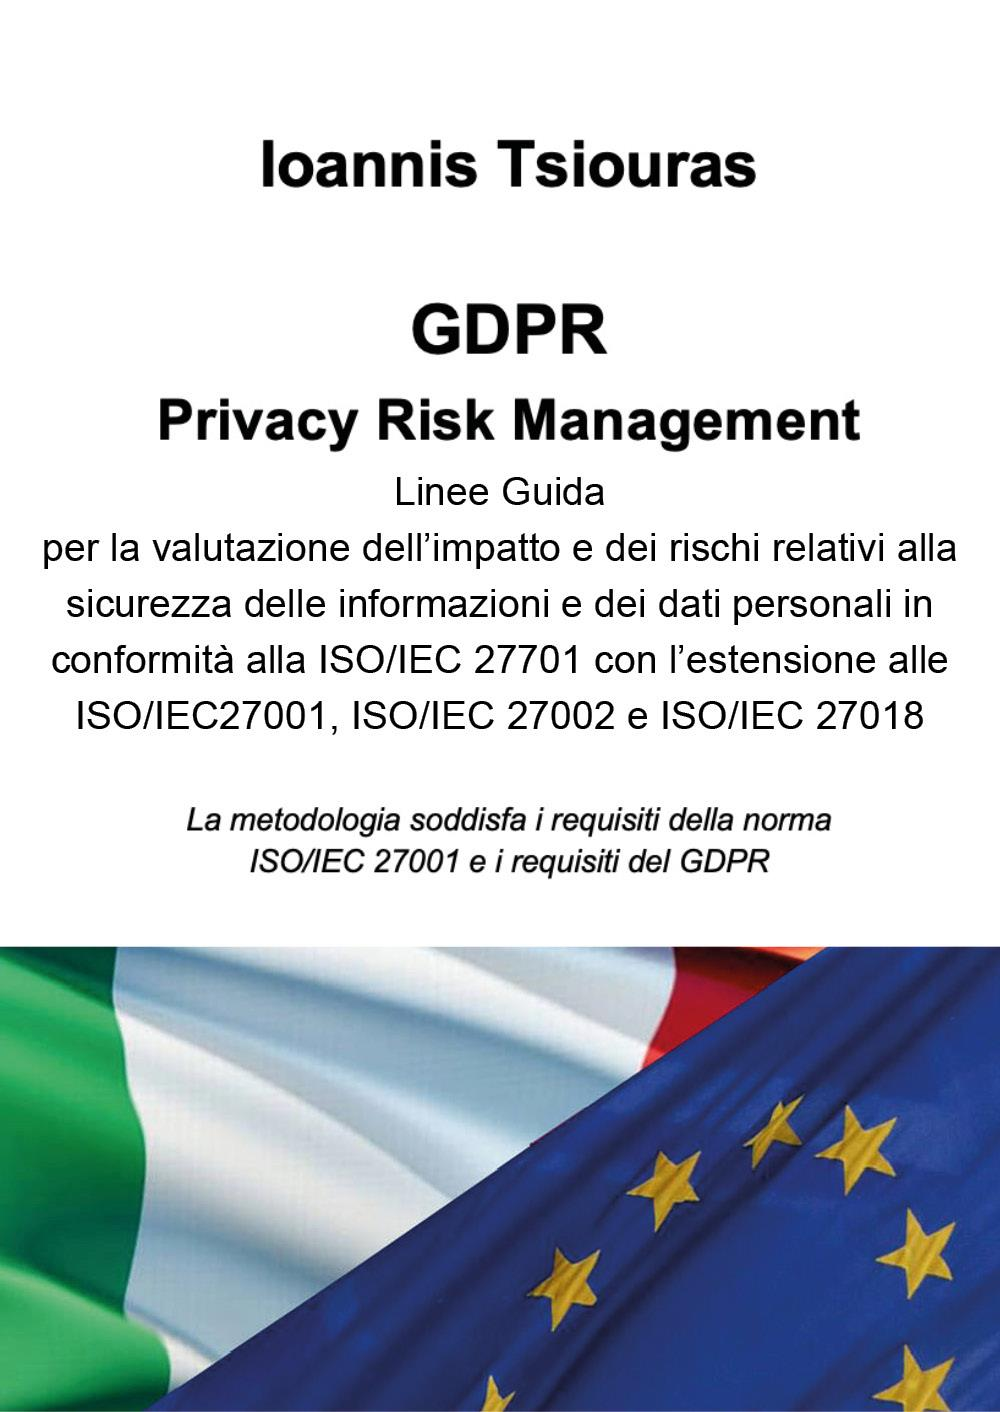 GDPR. Privacy Risk Management.